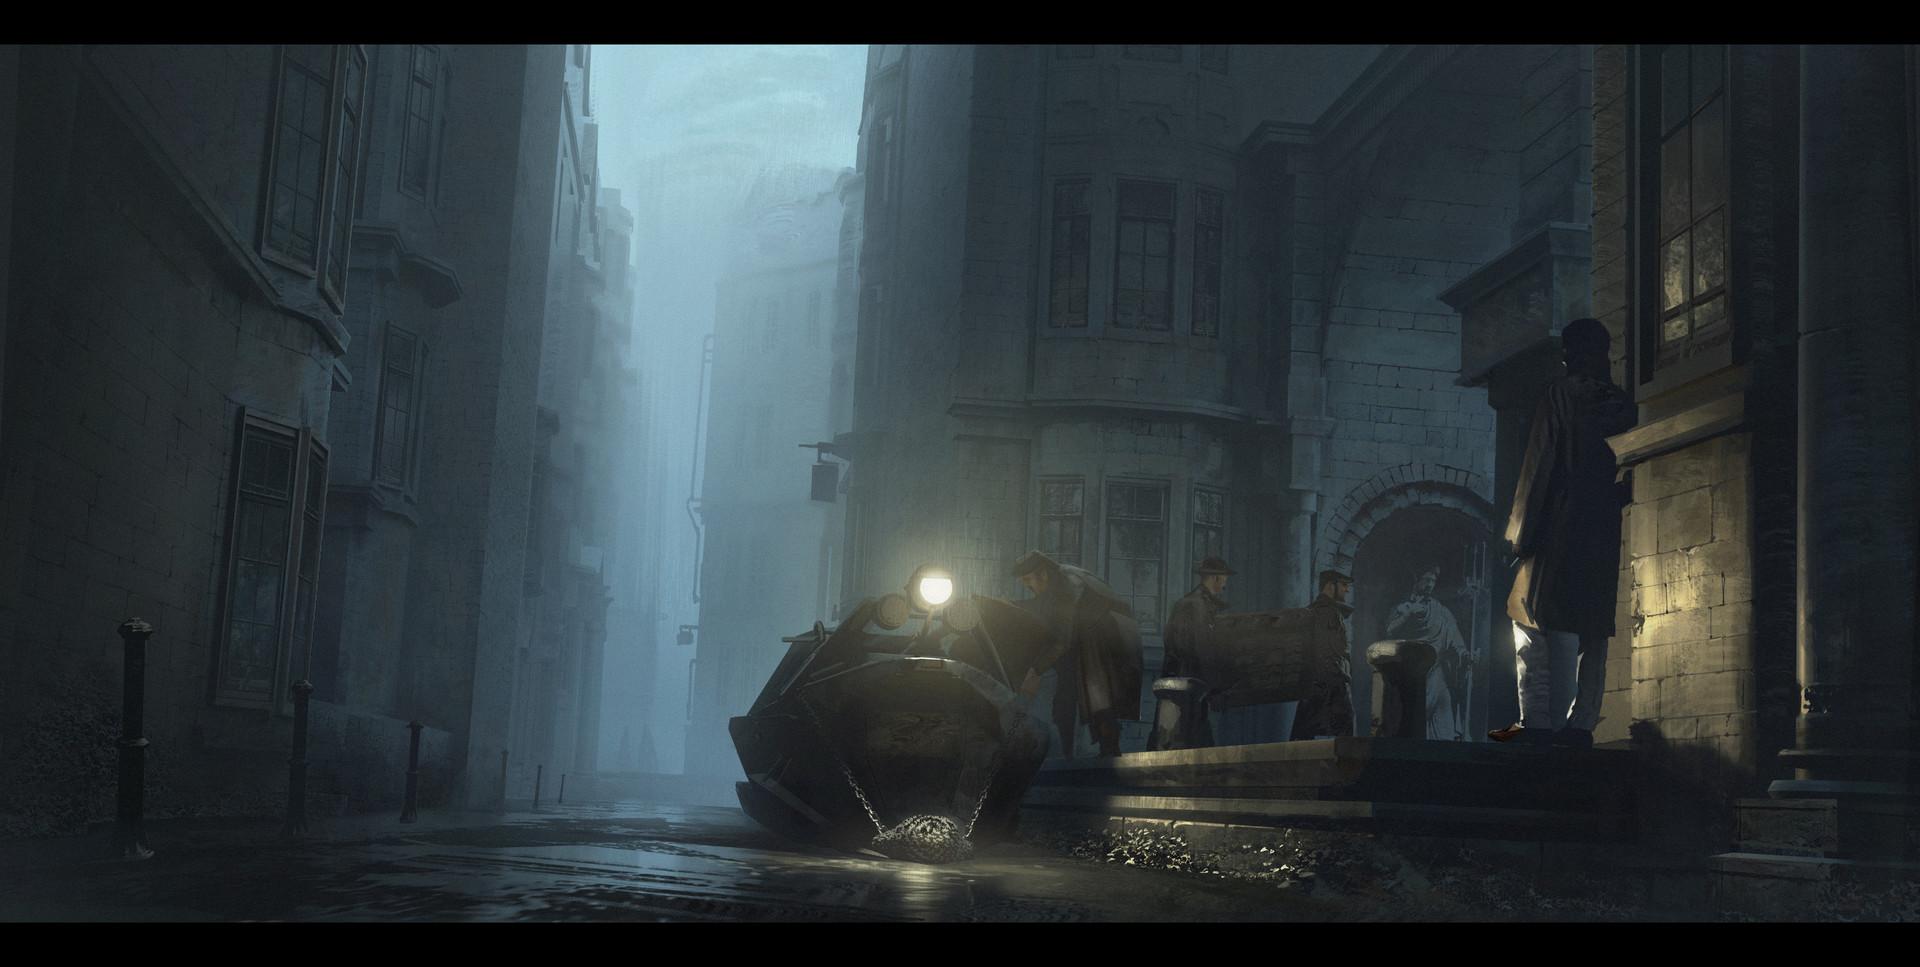 Connor sheehan render development 8047